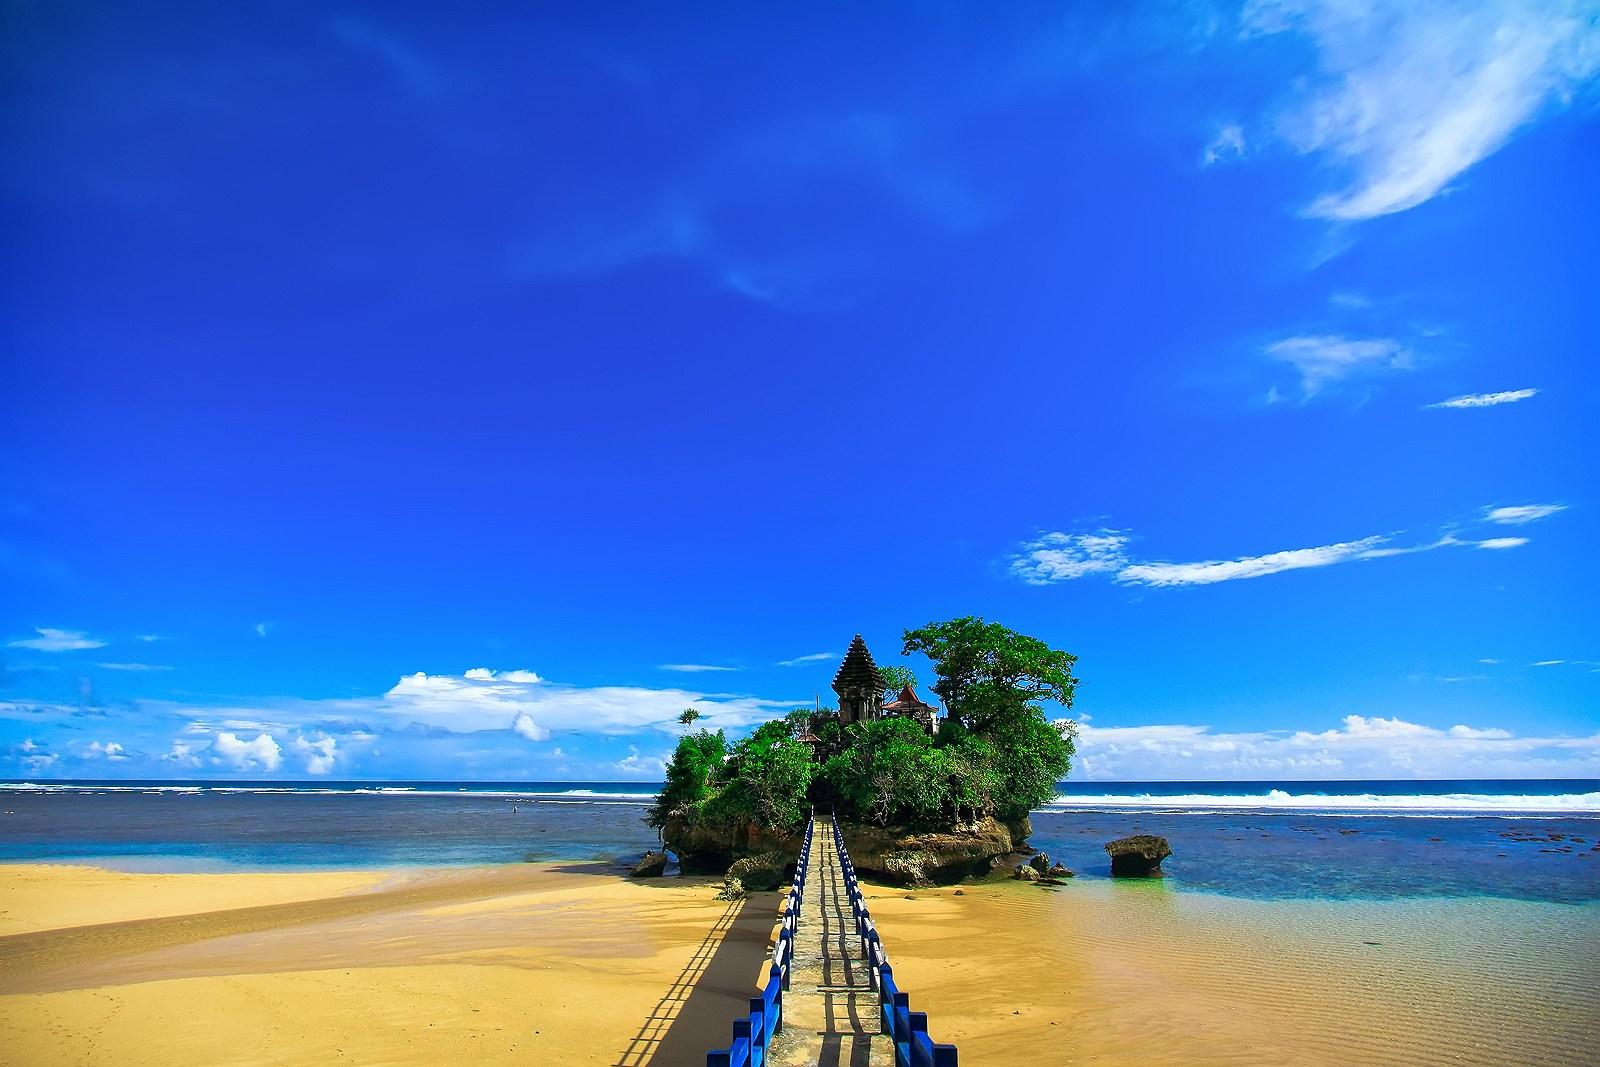 Daftar Pantai Malang Liburmulu Rekomendasi Liburan Kalian Kaliapus Kab